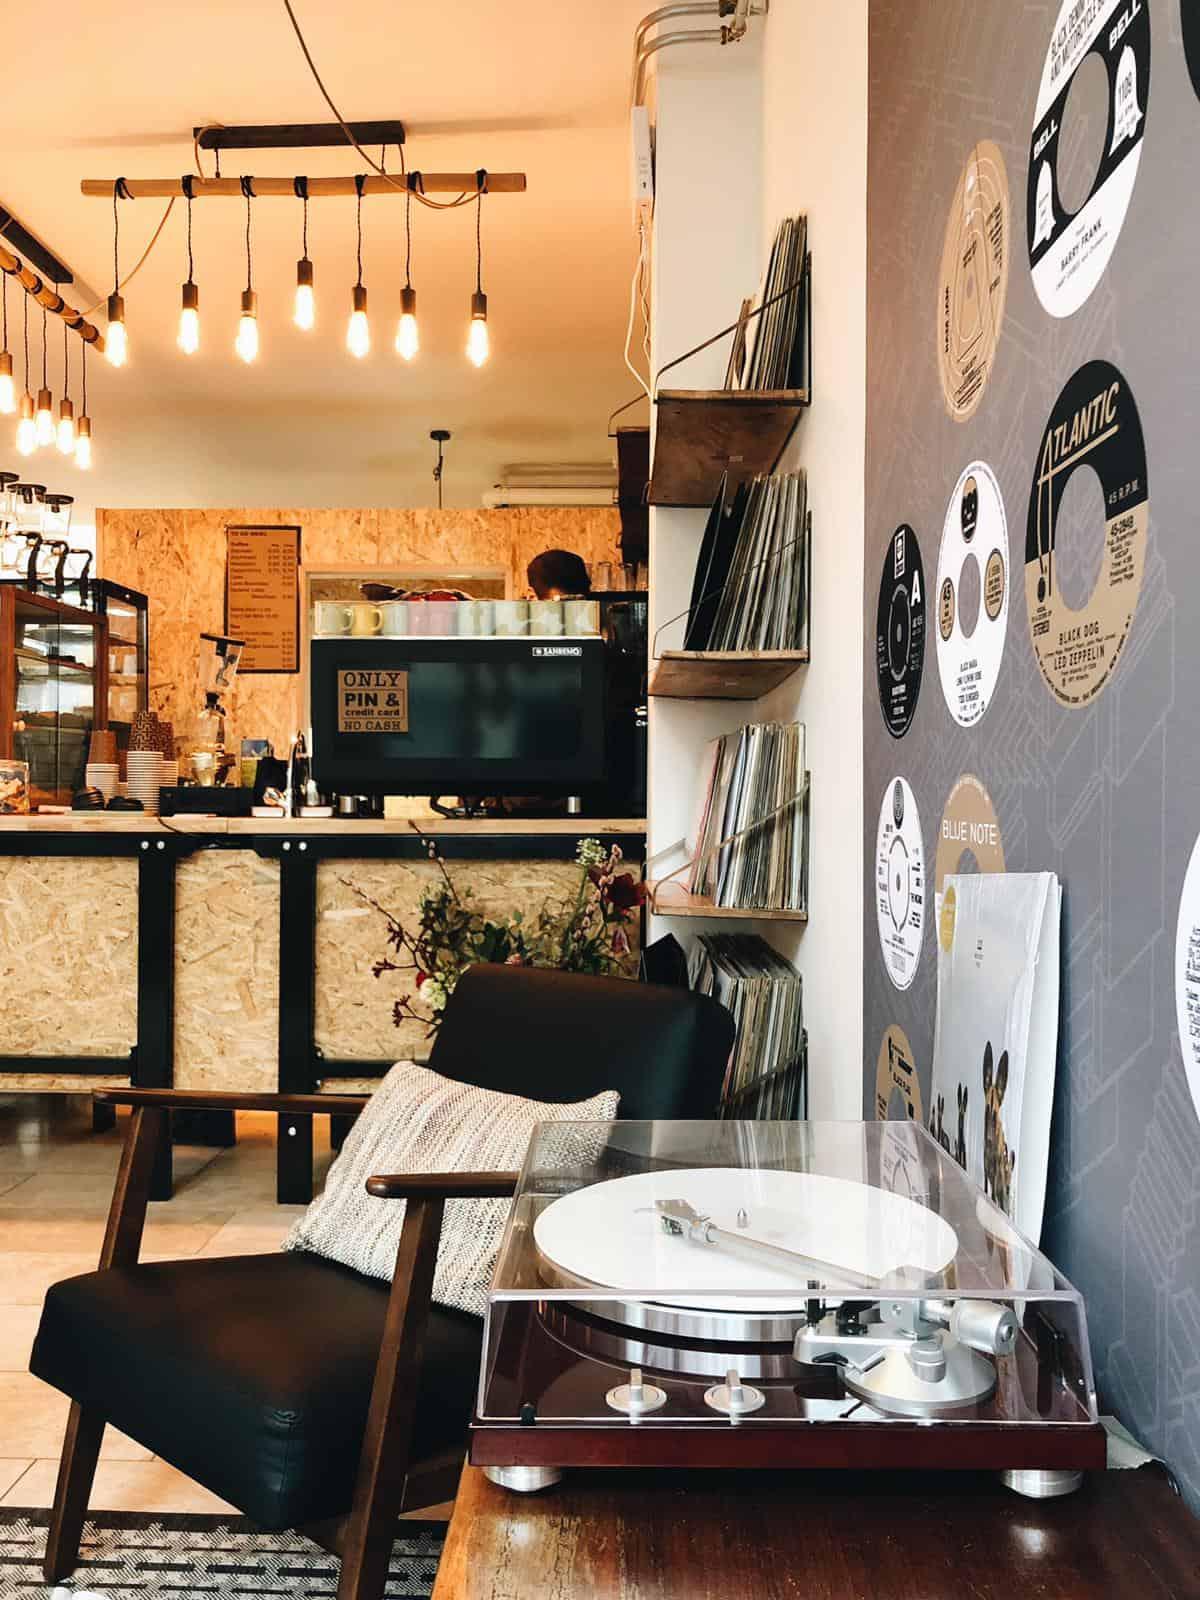 Hotspot Utrecht: Koffie & muziek bij koffietent Black Brew